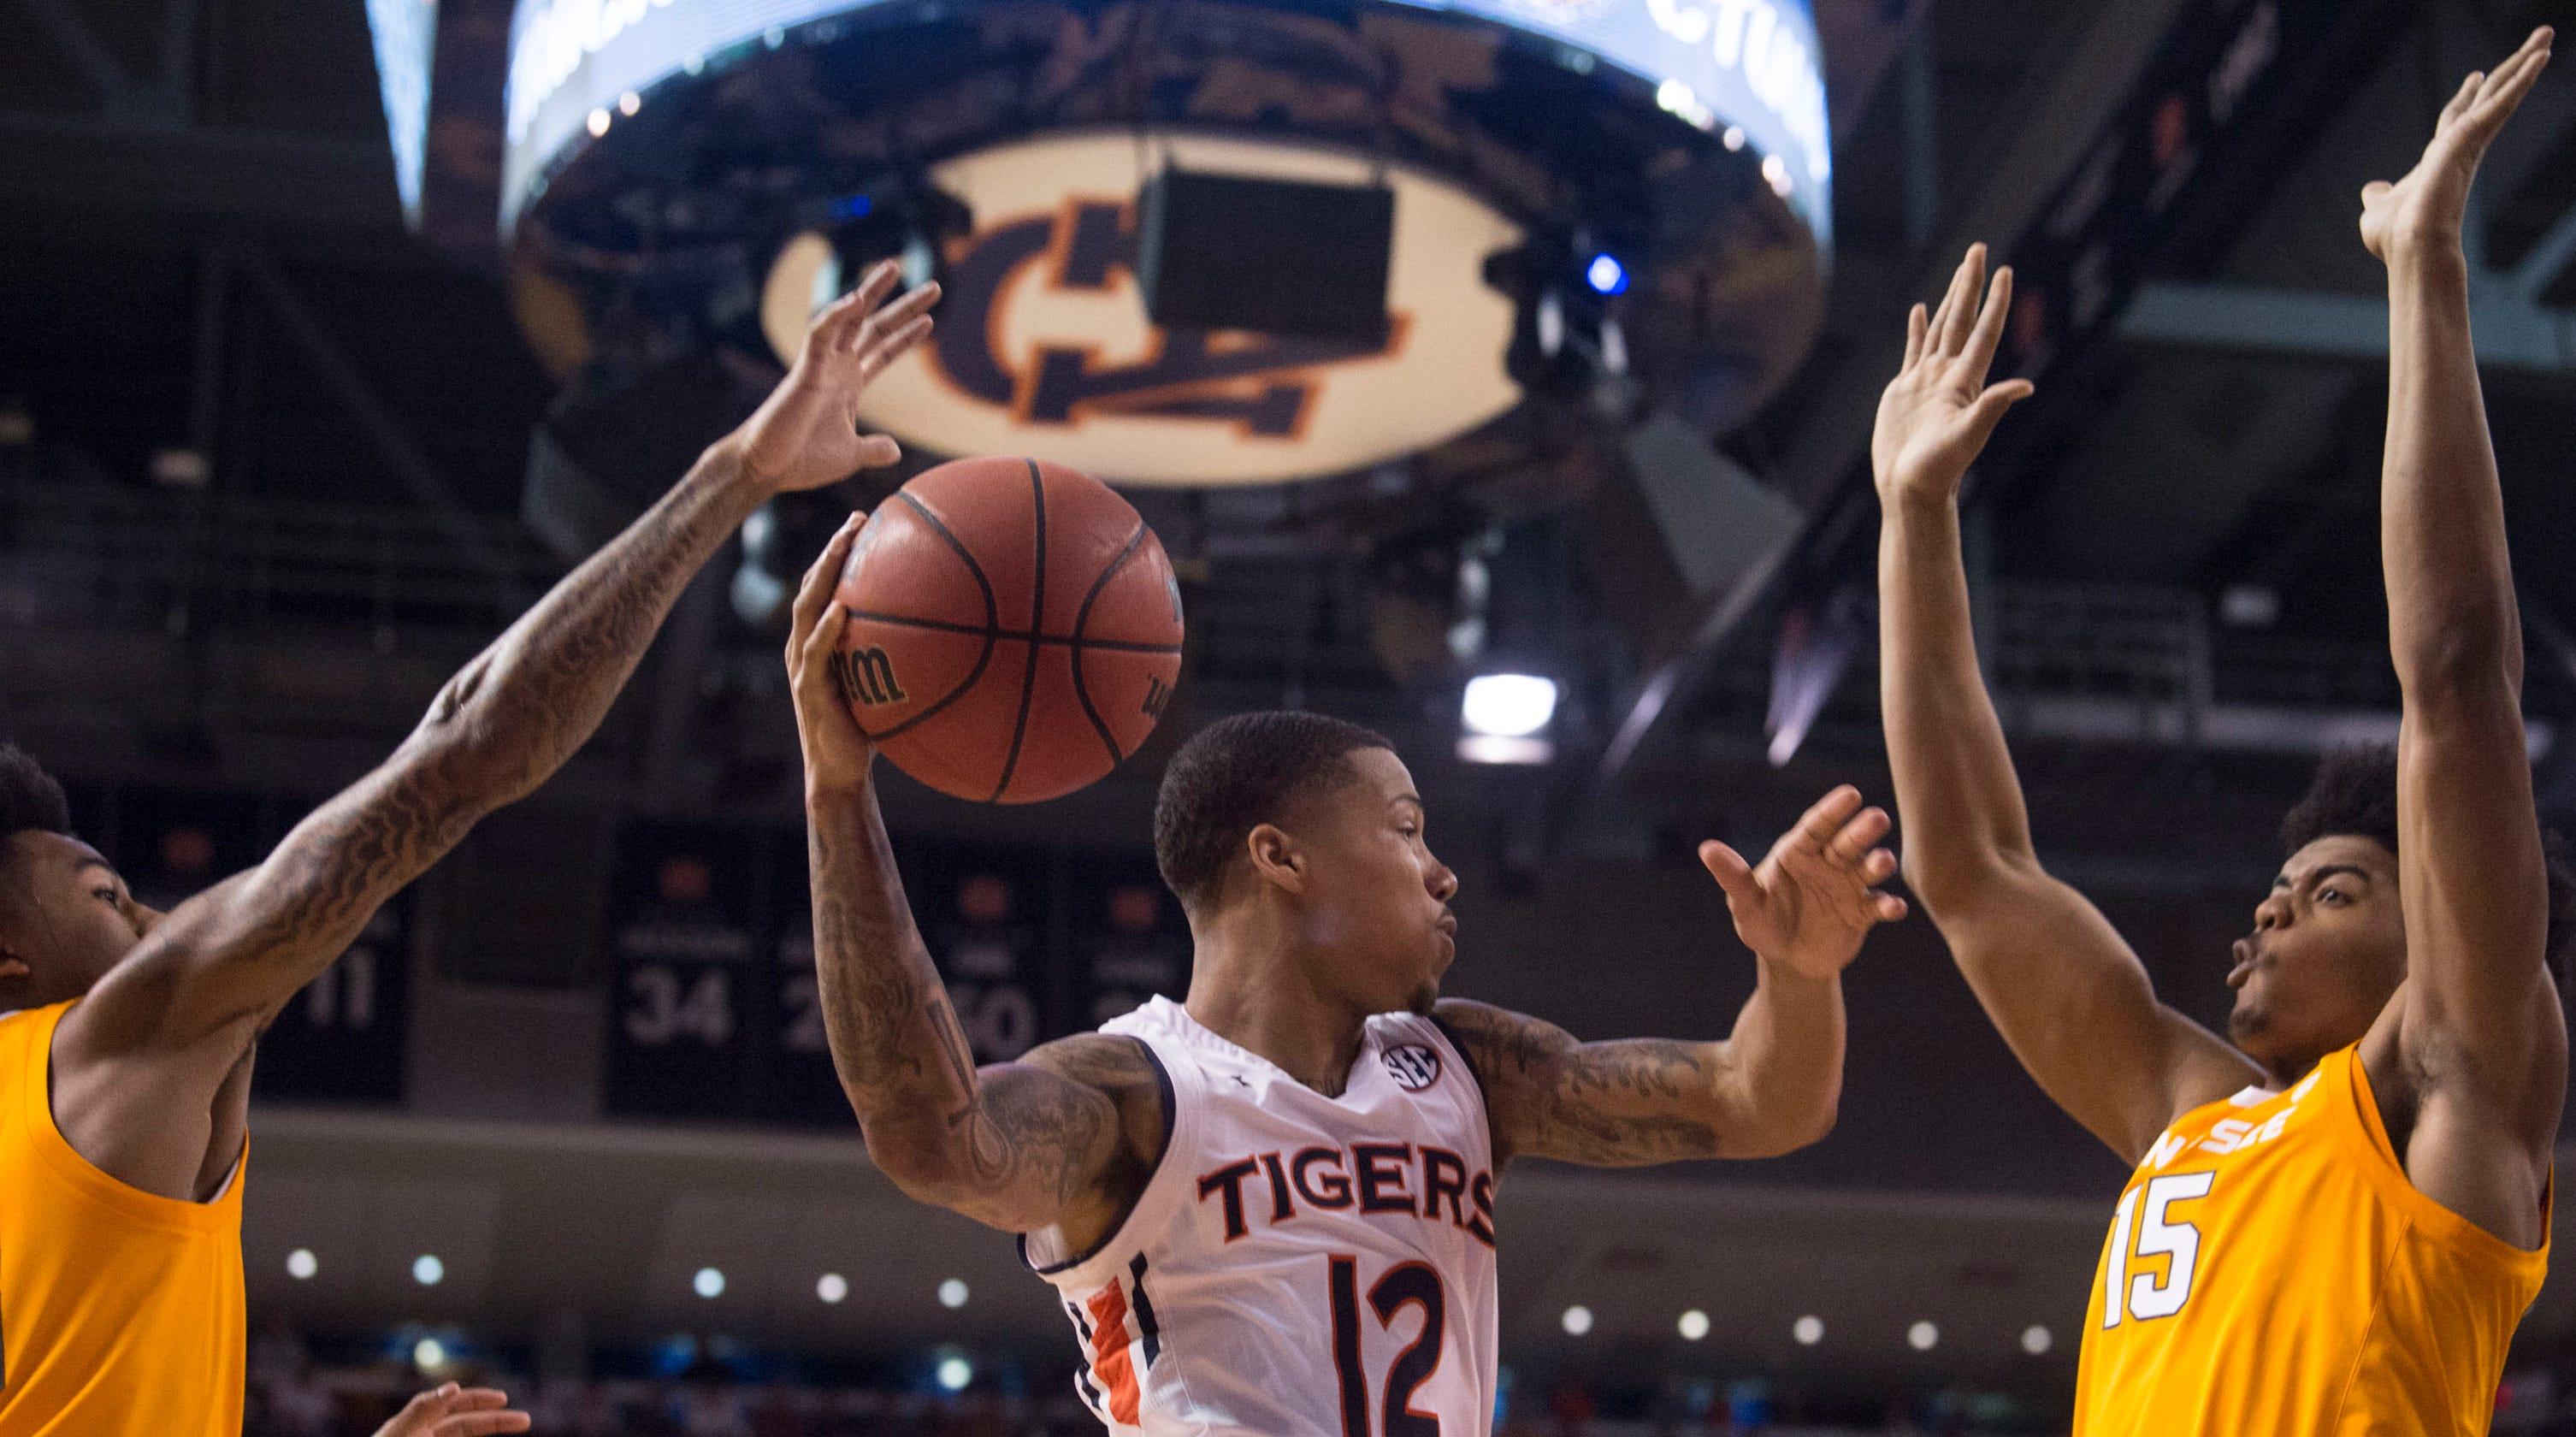 SEC basketball Tournament 2019: Bracket, schedule, how to watch